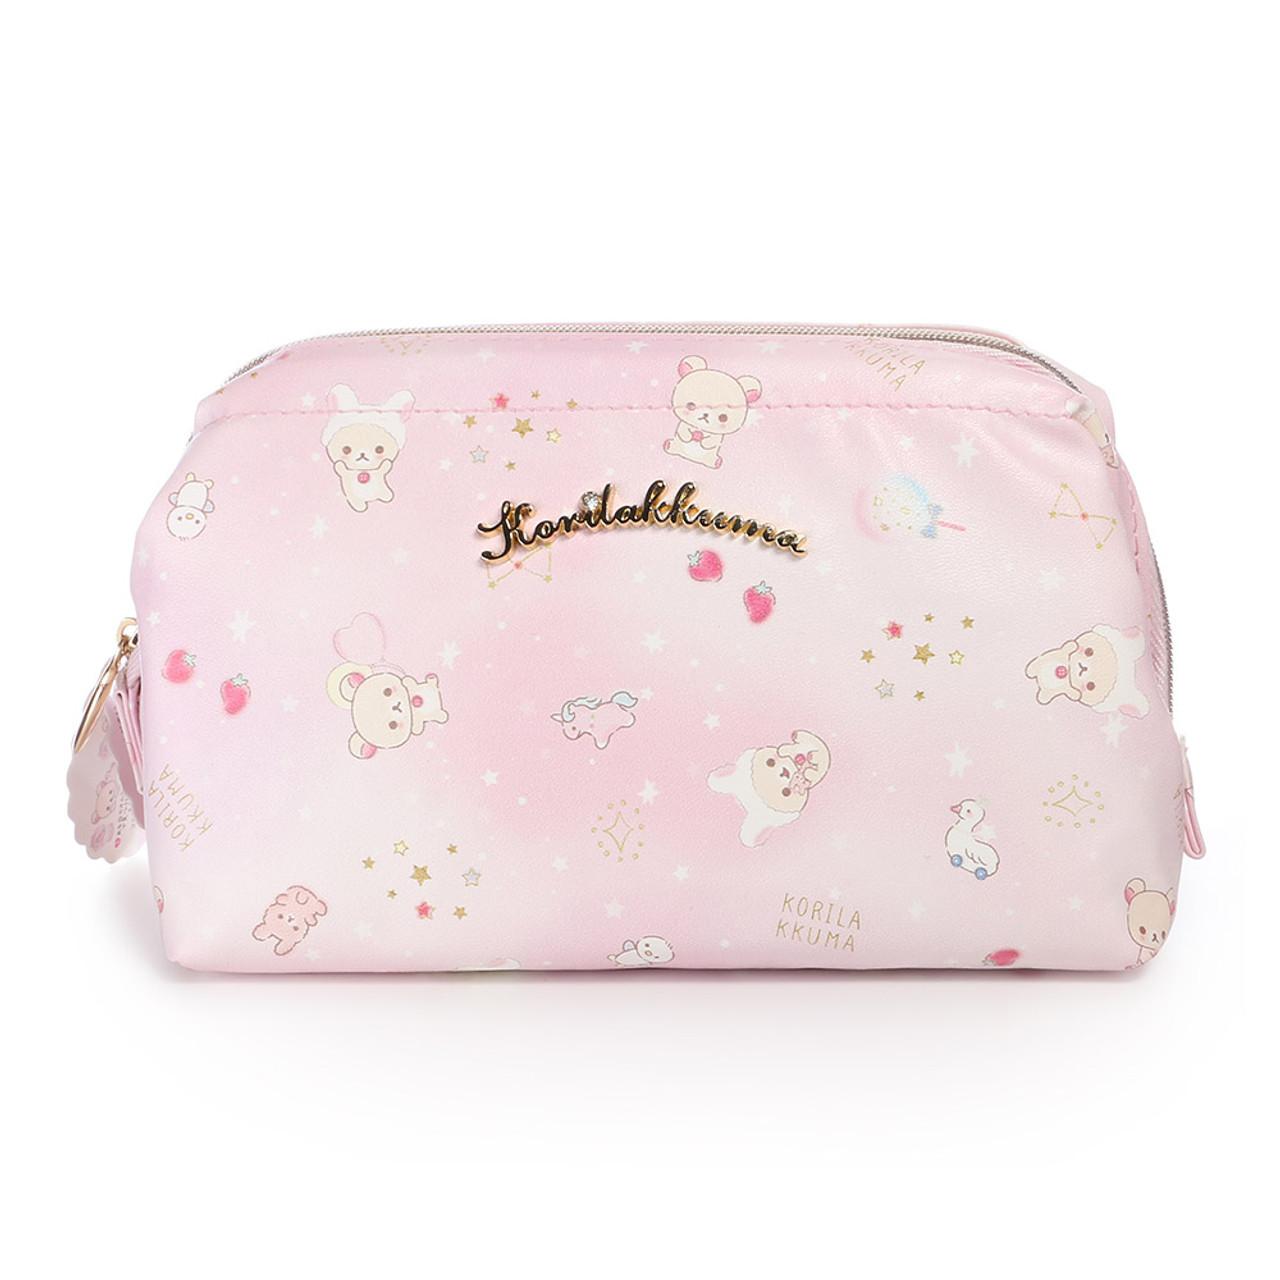 Korilakkuma Pink Fantasty Dream Pouch ( Front View )